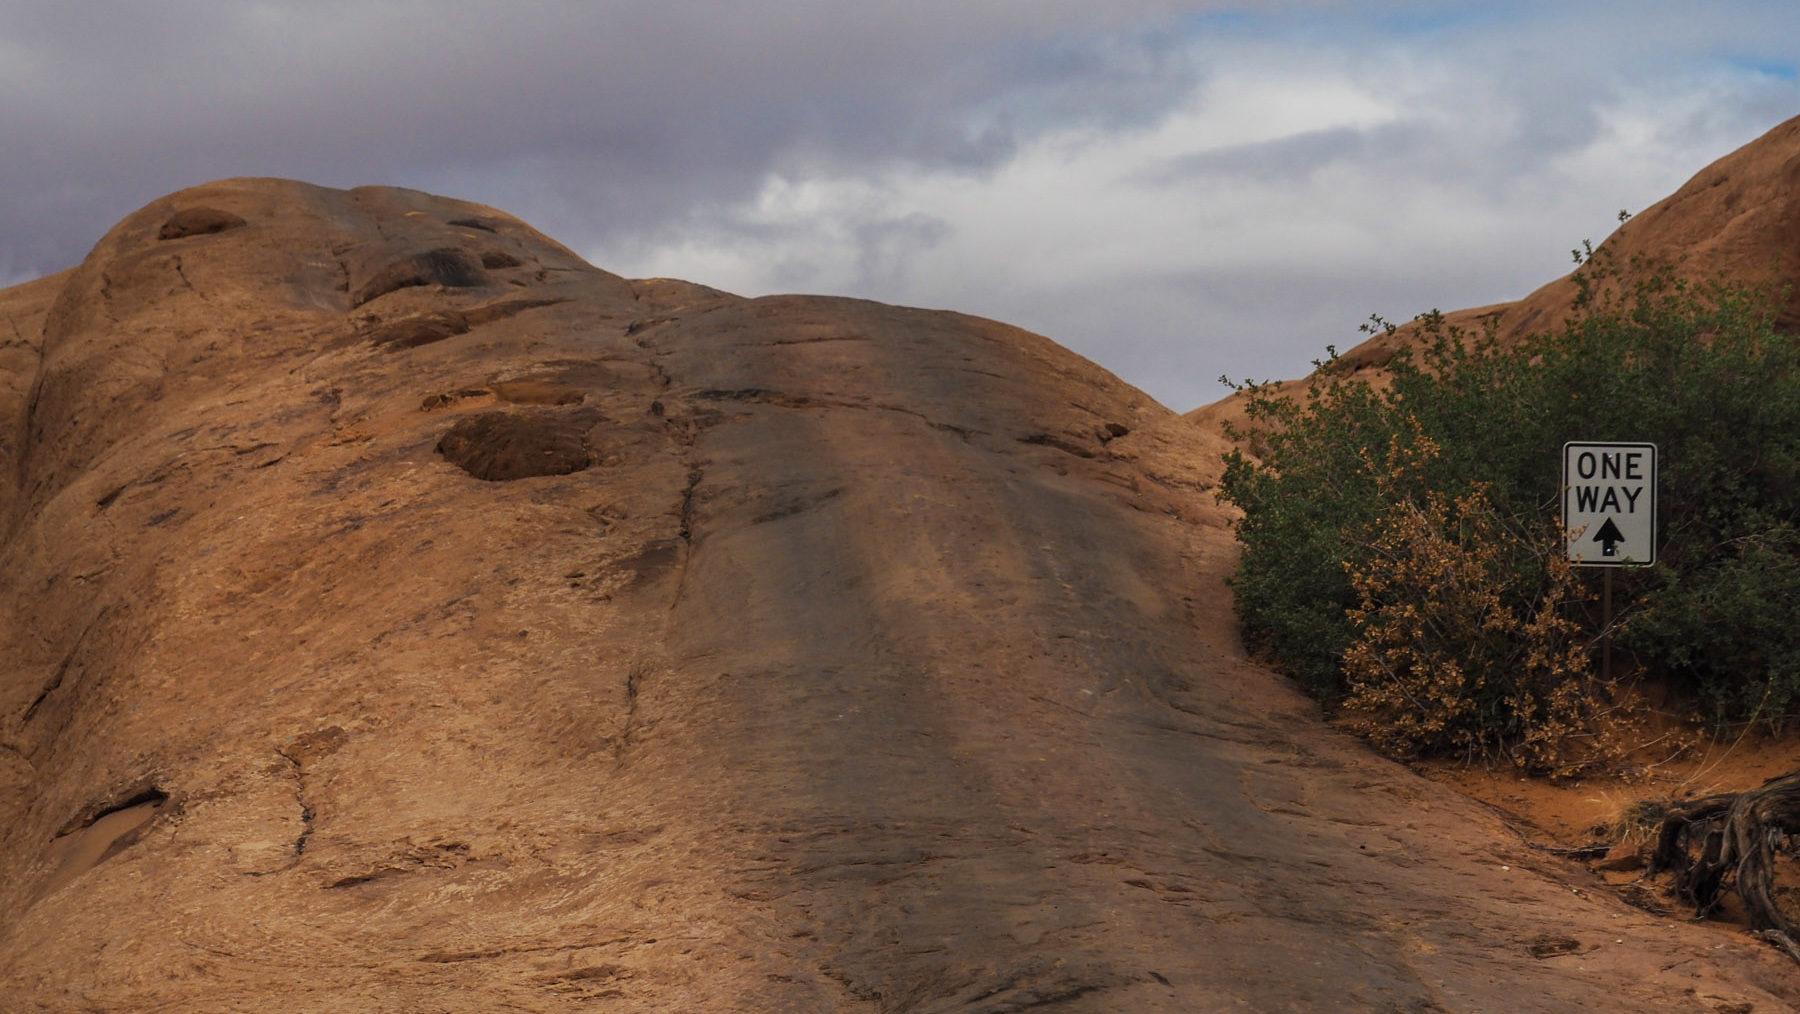 Moab – unglaublich was hier alles fahrbar ist!